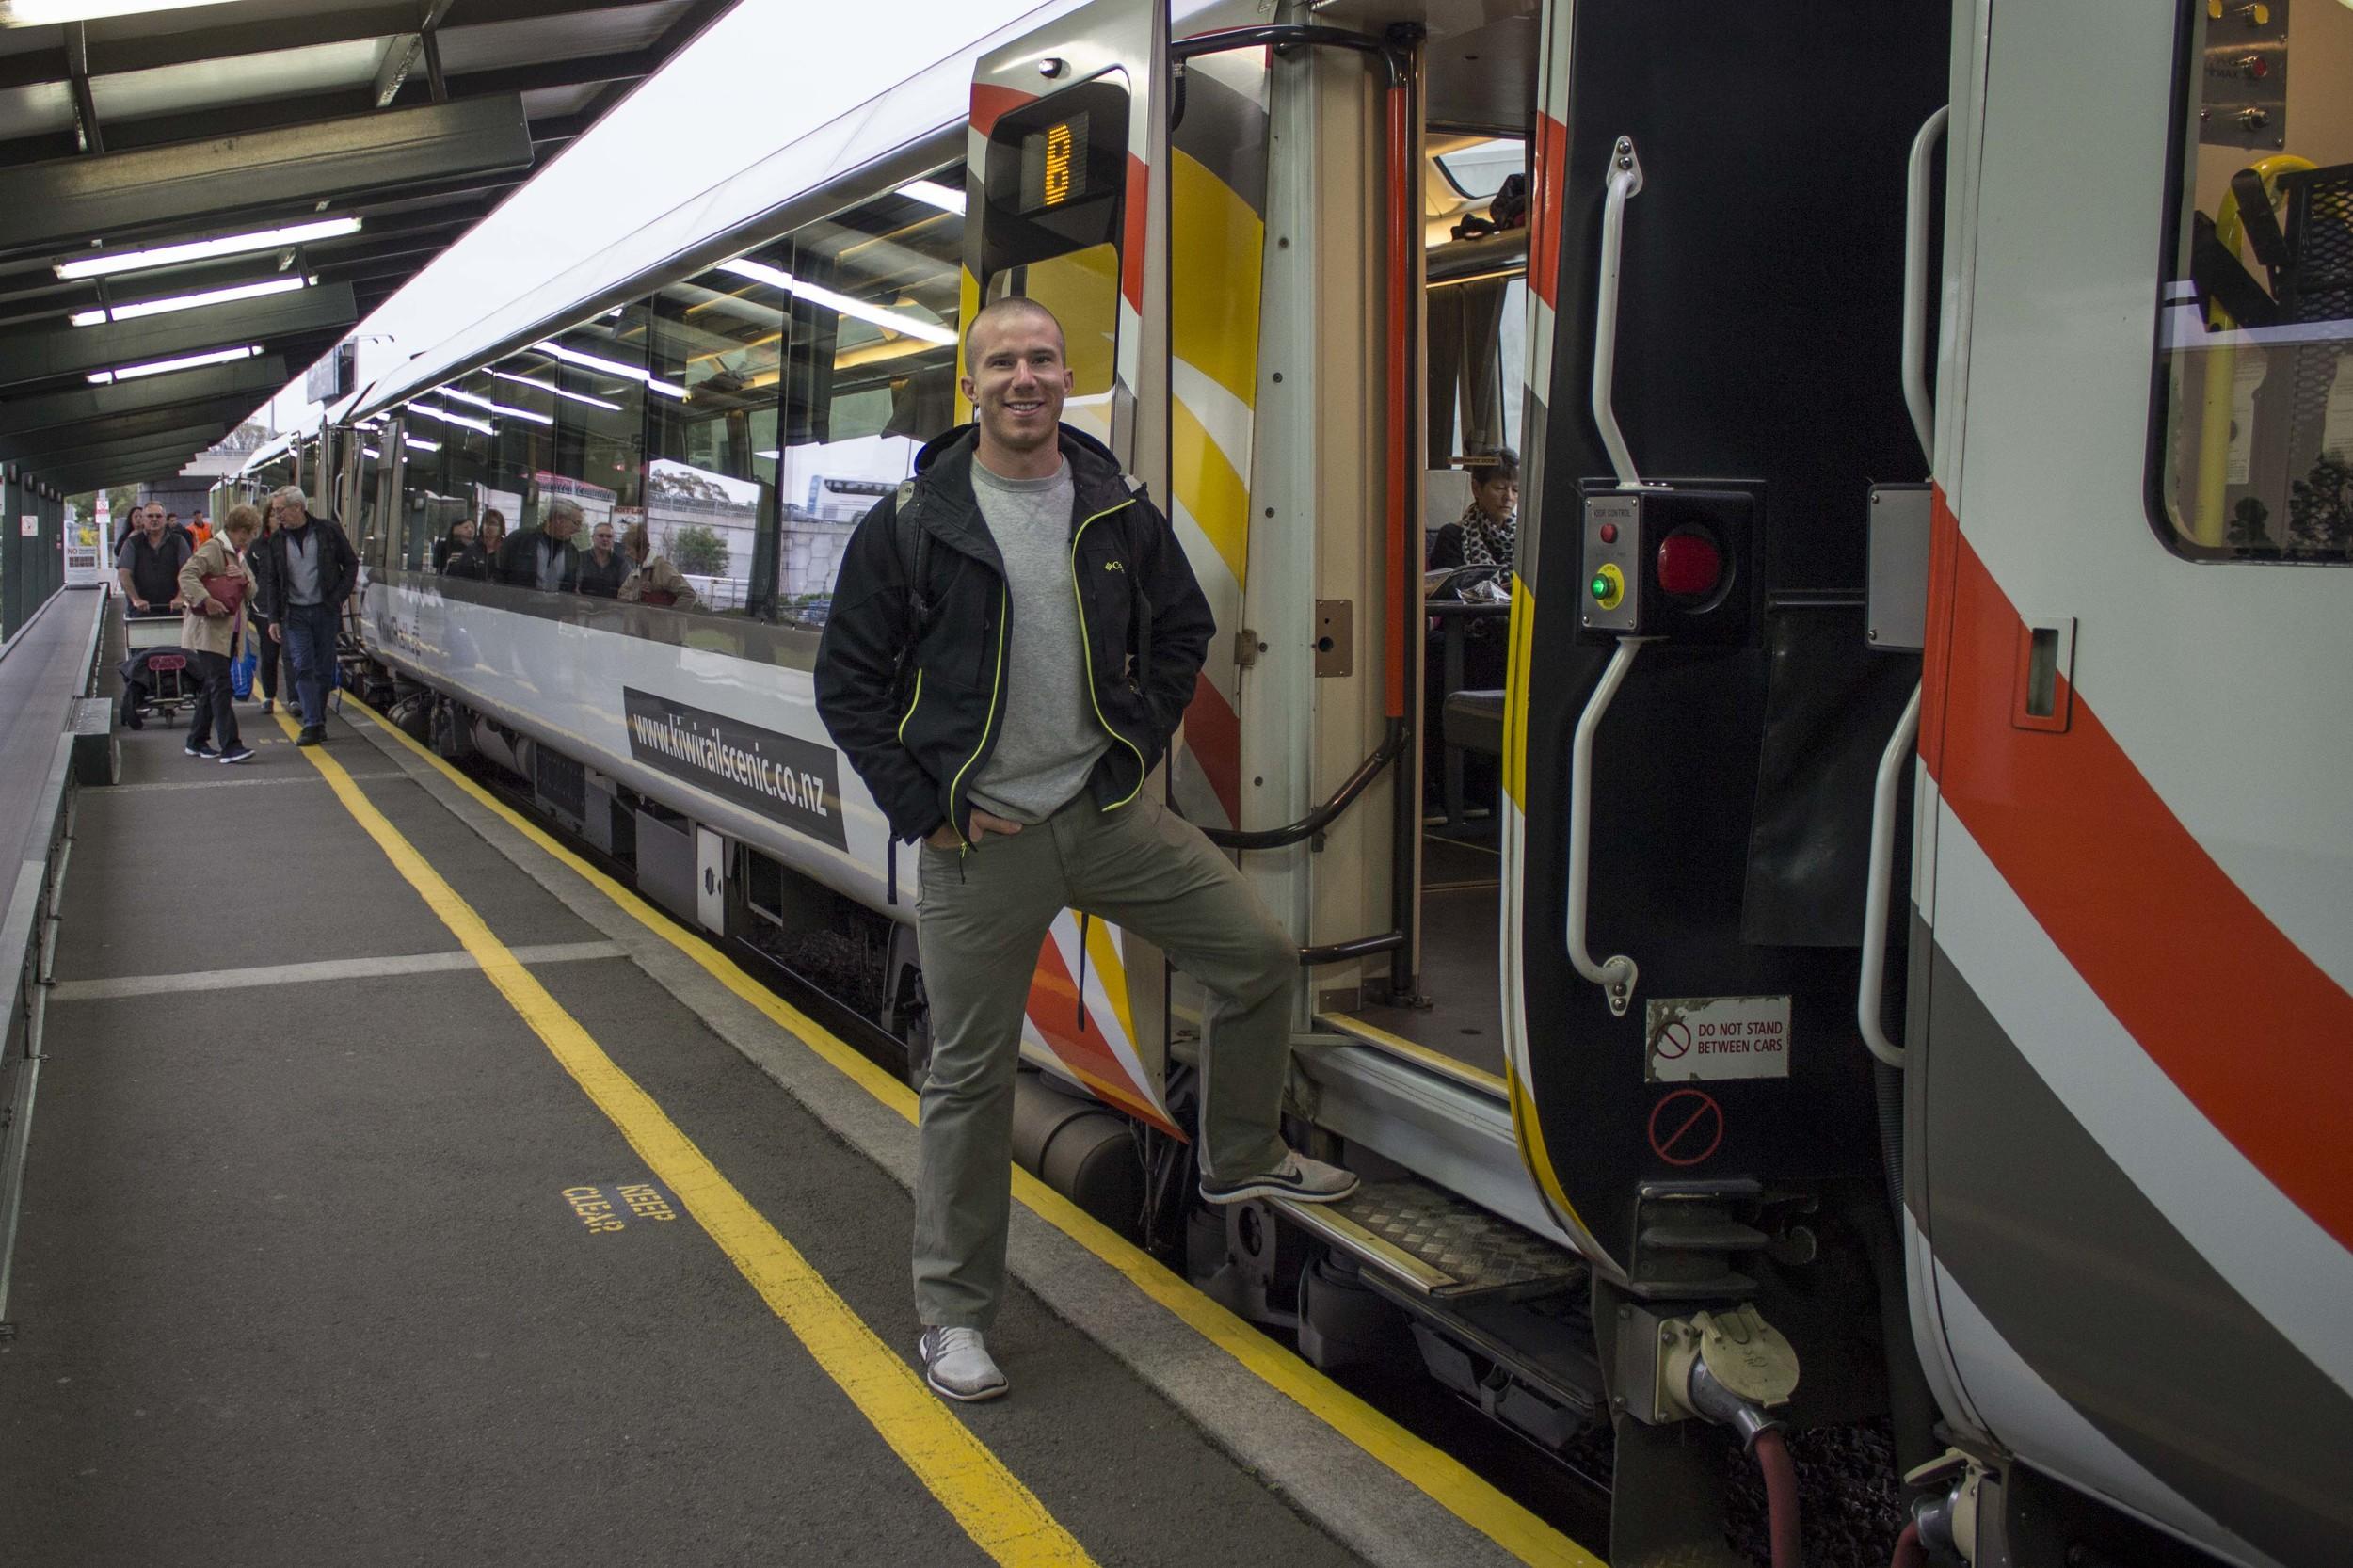 Waiting to board the TranzAlpine